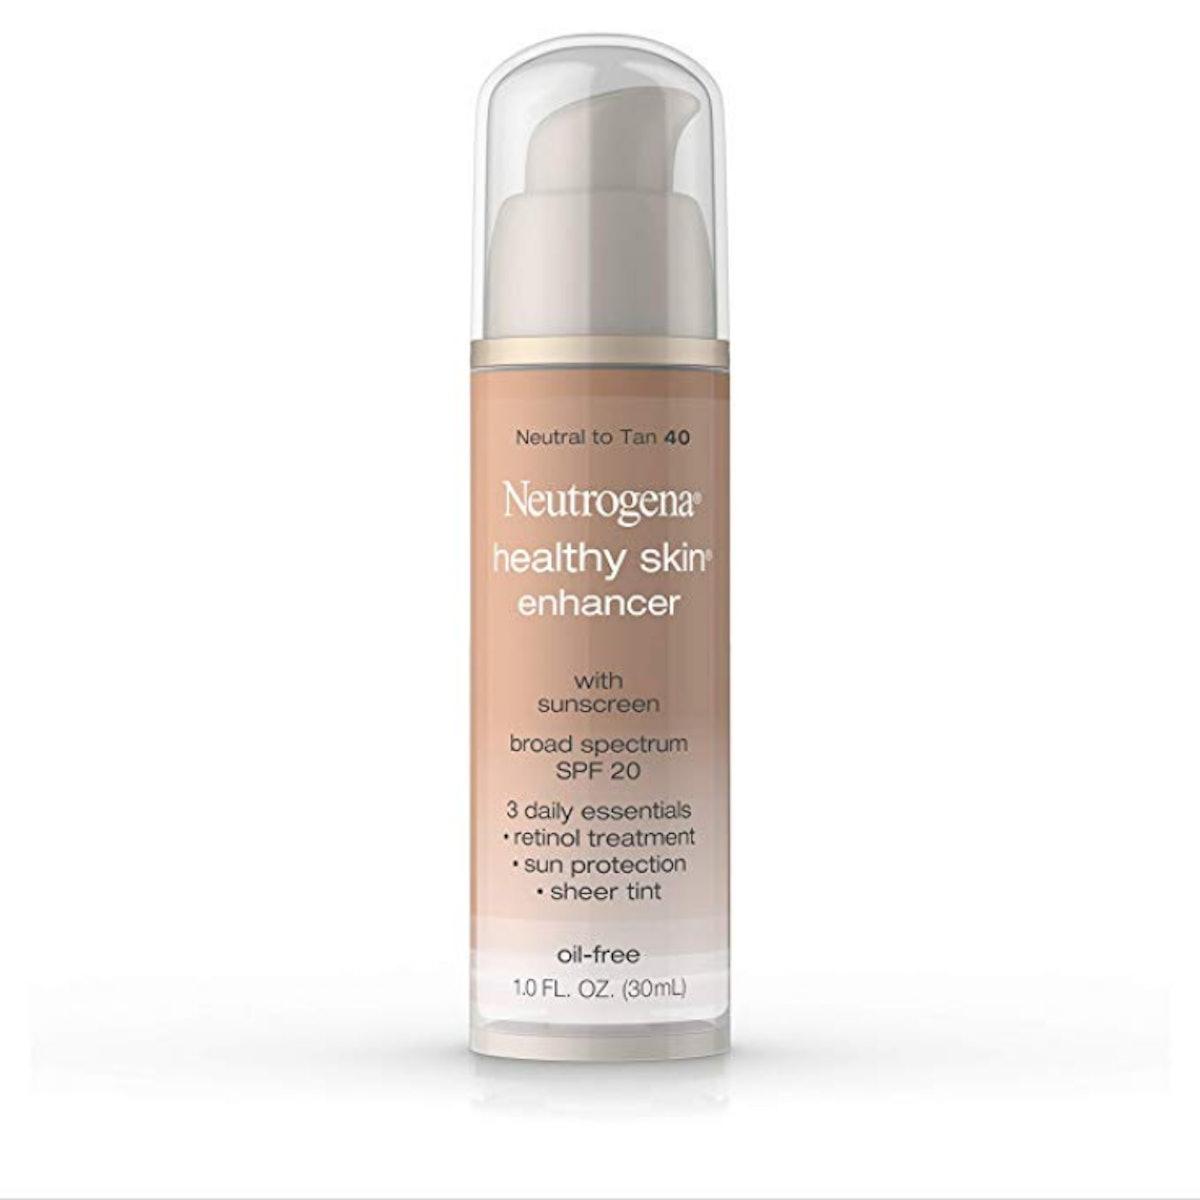 Neutrogena Healthy Skin Enhancer Sheer Face Tint With Retinol